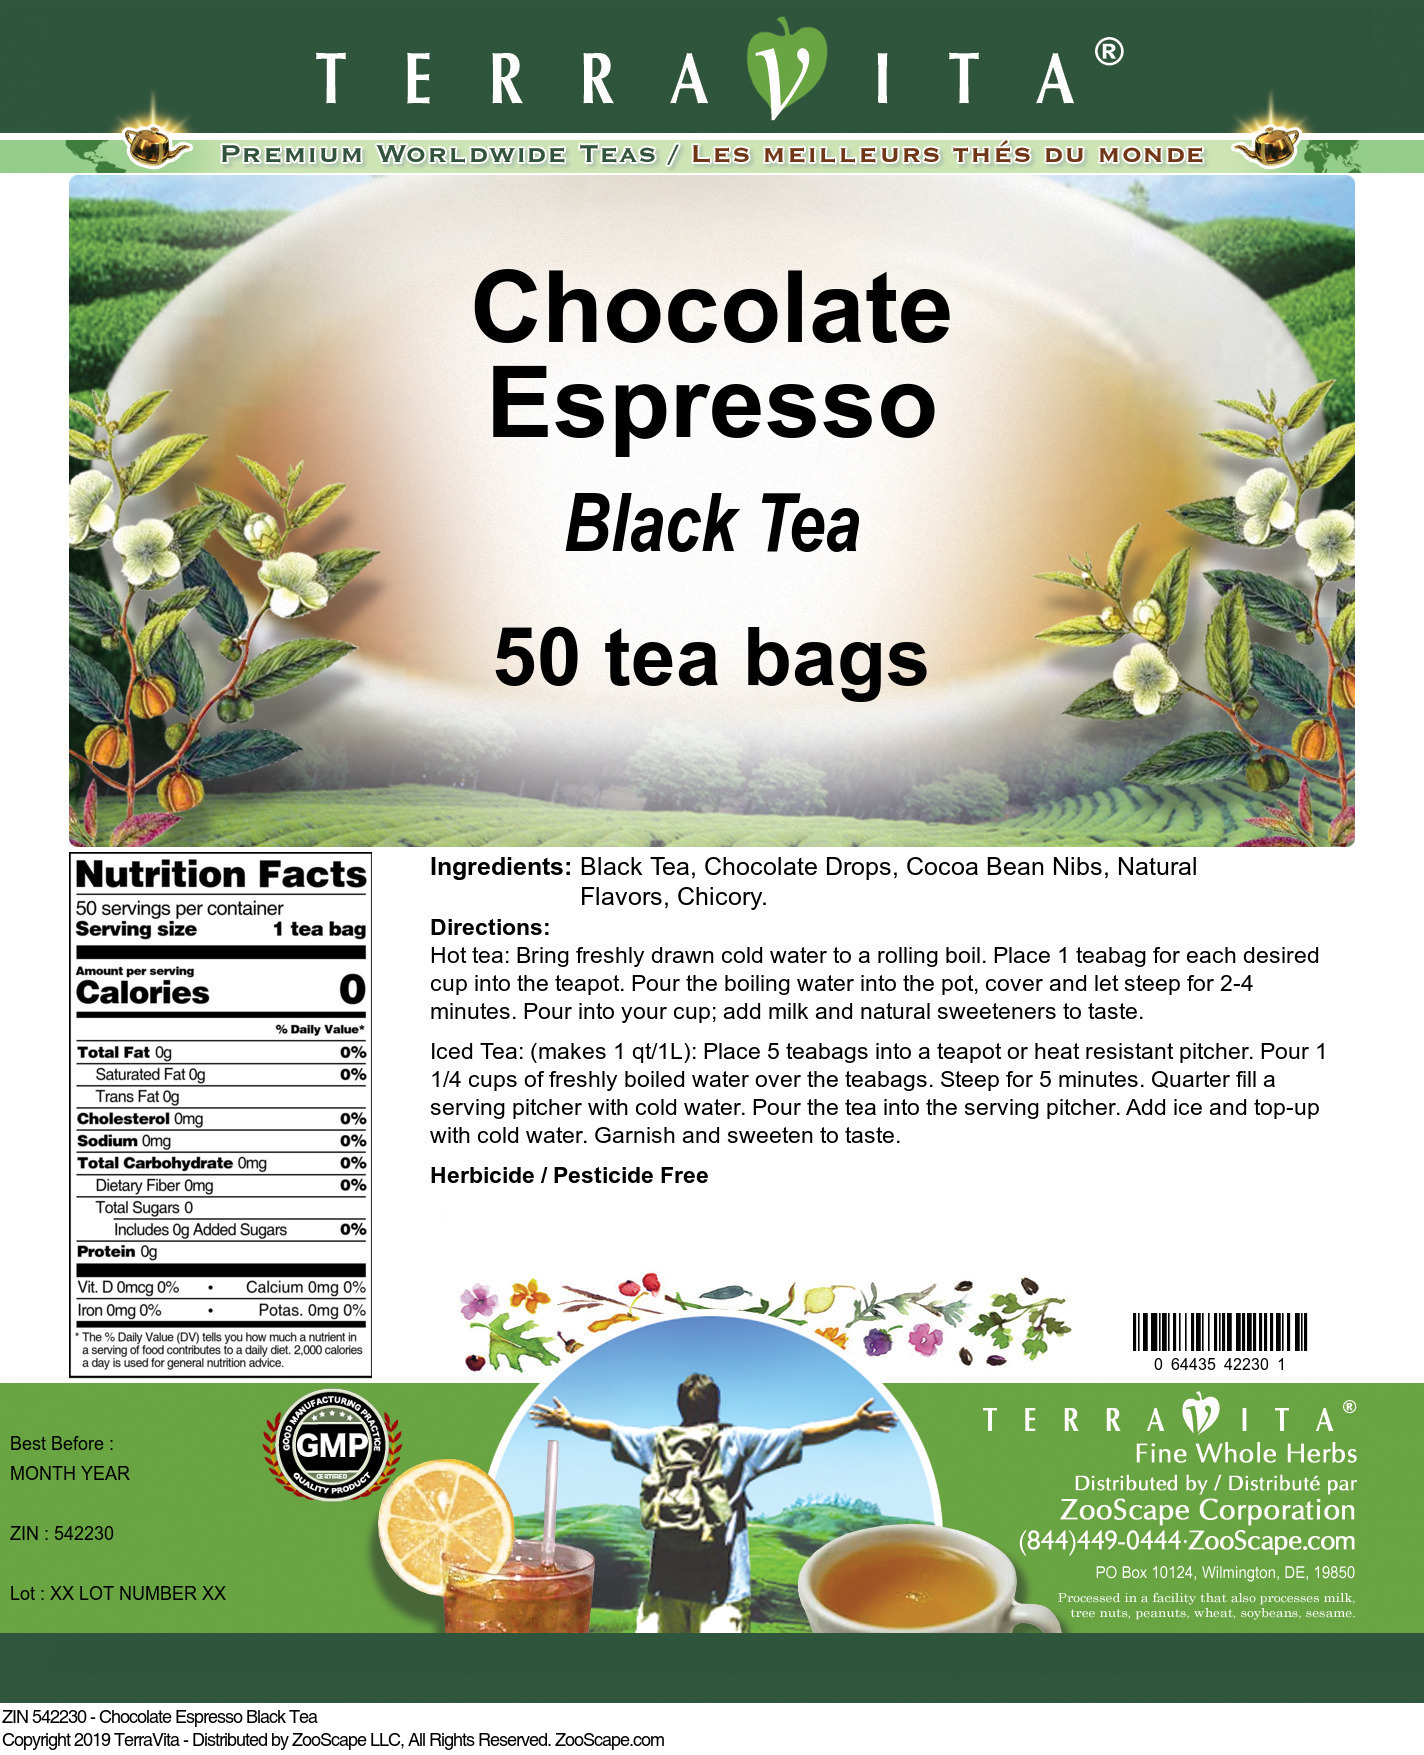 Chocolate Espresso Black Tea